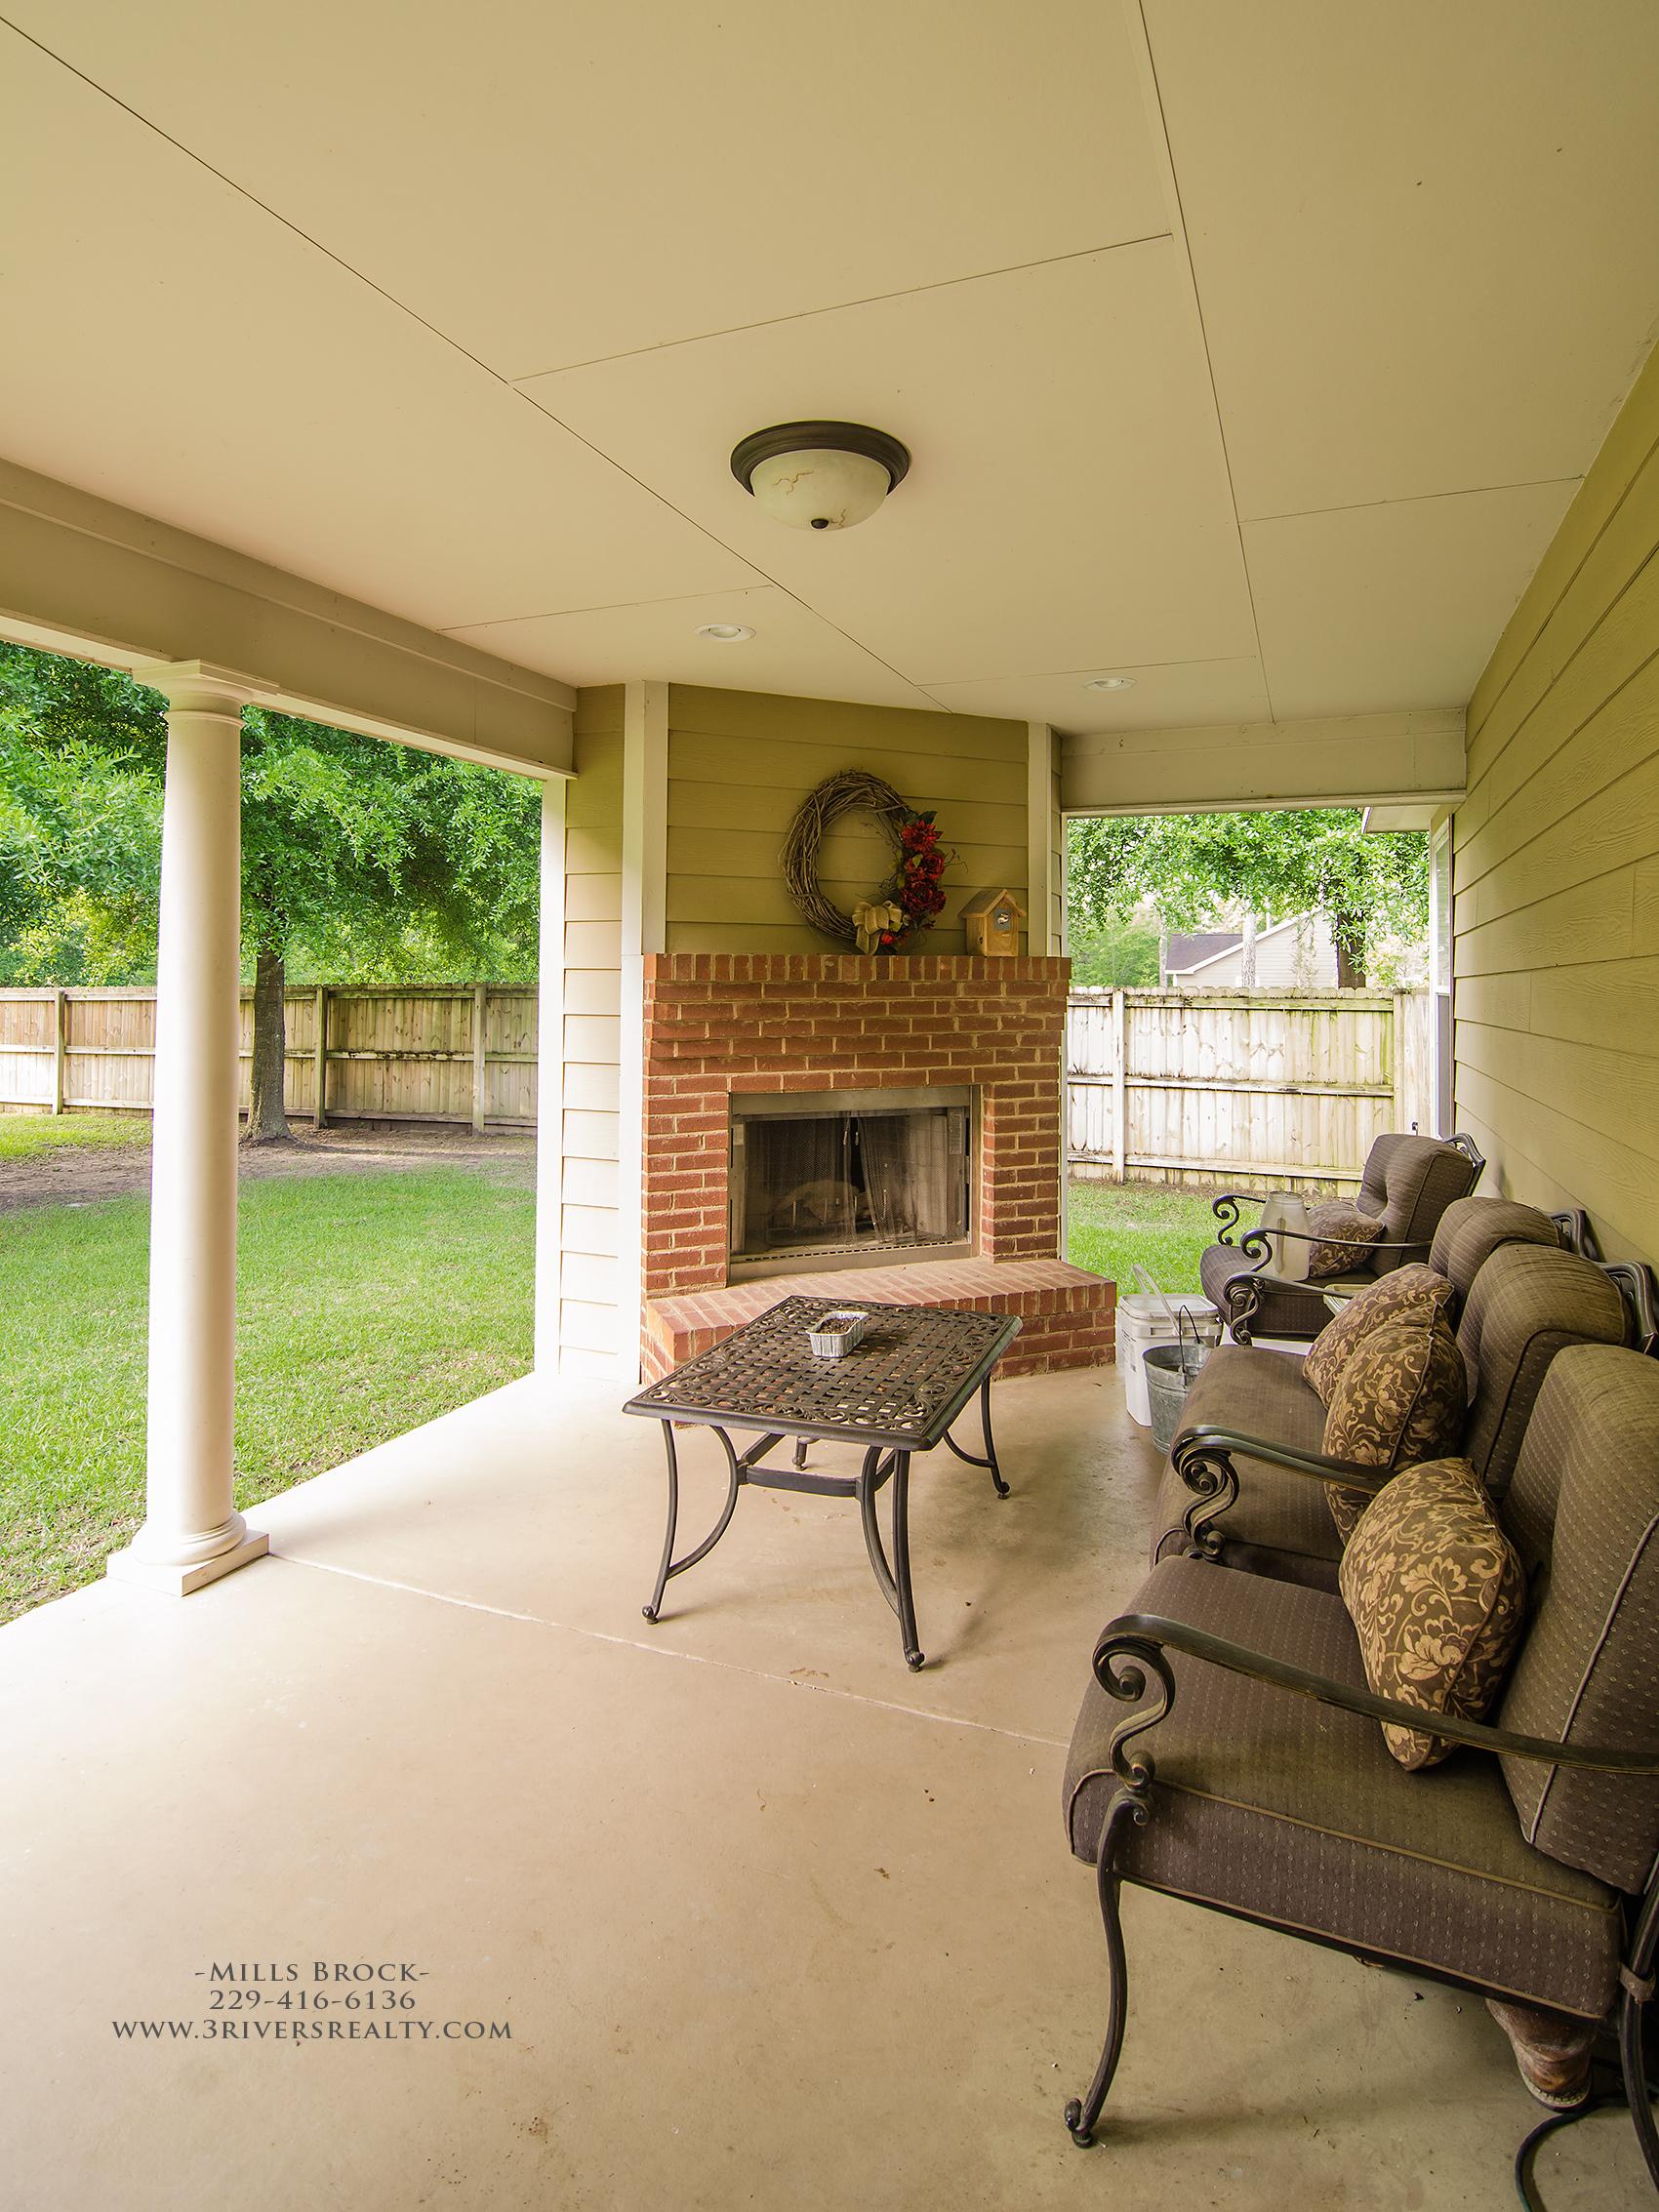 3riversrealty_bainbridge-georgia-home-for-sale_3-bed-2-bath_outdoor-fireplace_three-rivers-realty_mills-brock_Taurus-USA_-pool_back-porch-fireplace - Copy.jpg